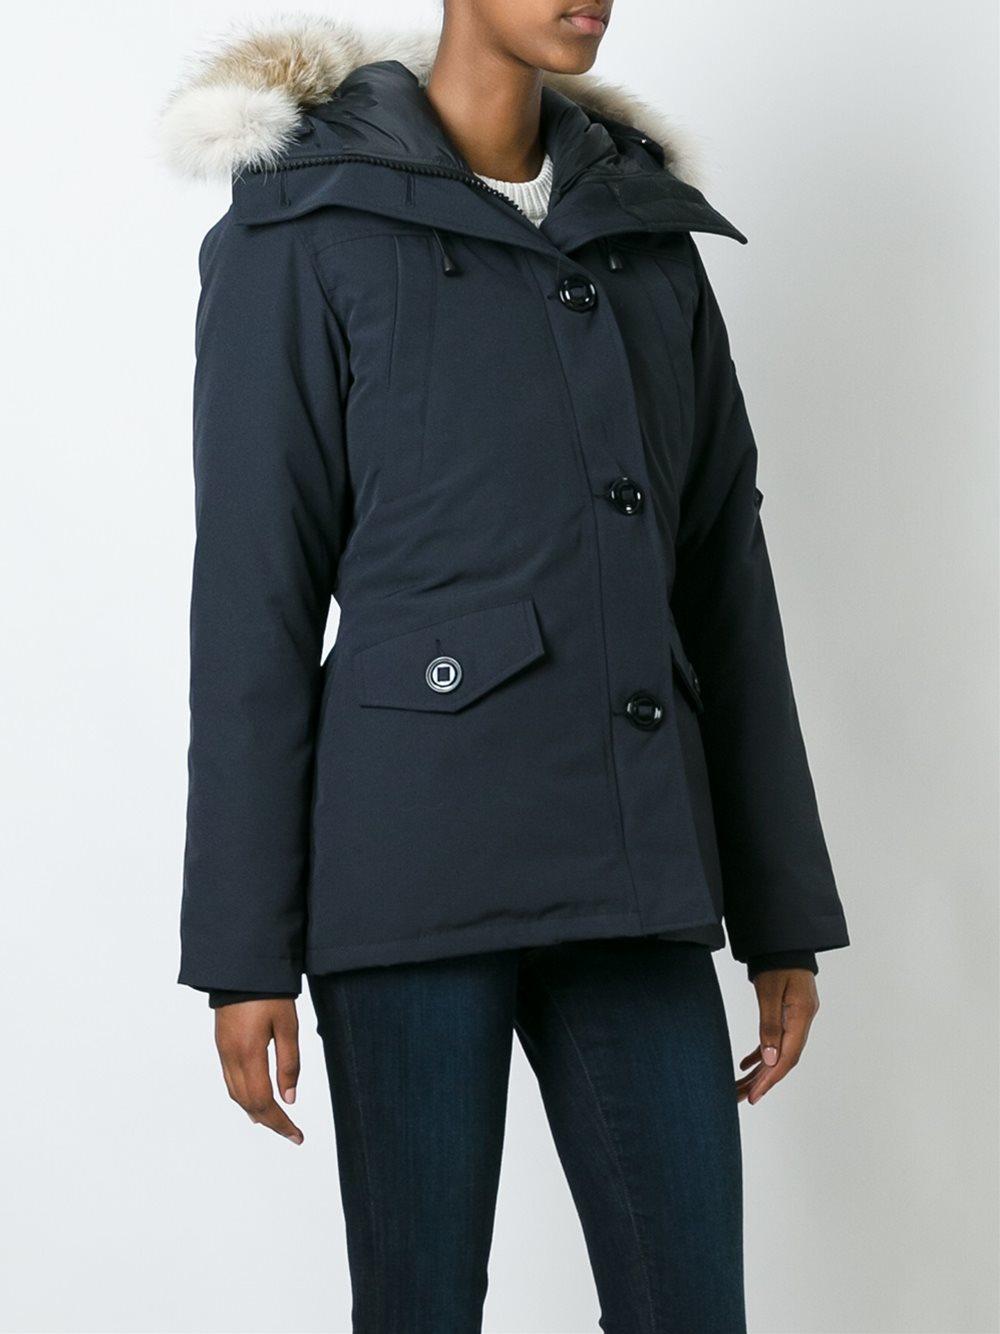 Canada Goose langford parka sale store - Canada goose 'montebello' Parka Coat in Blue   Lyst